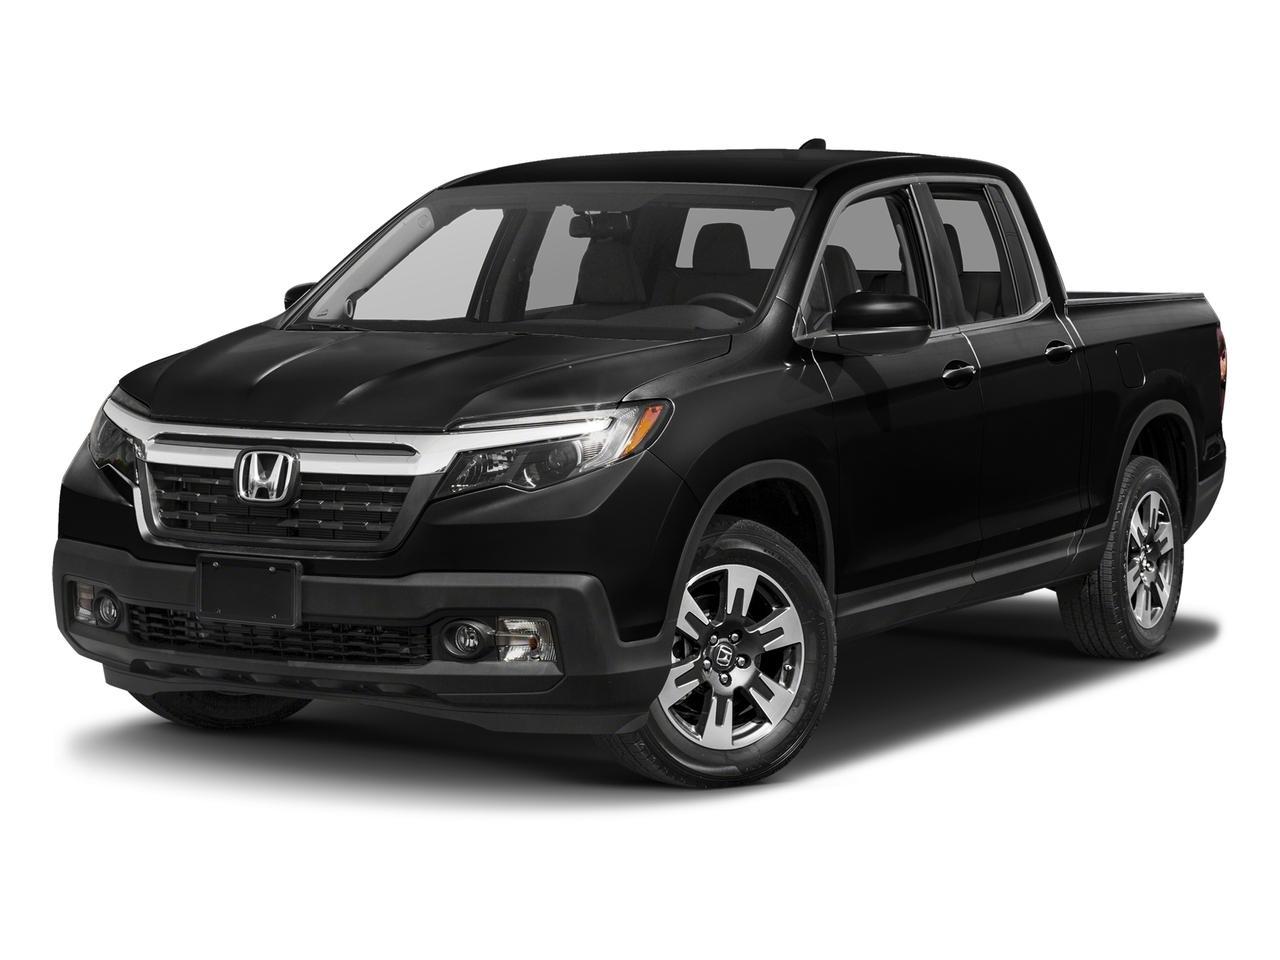 2017 Honda Ridgeline Vehicle Photo in Houston, TX 77074